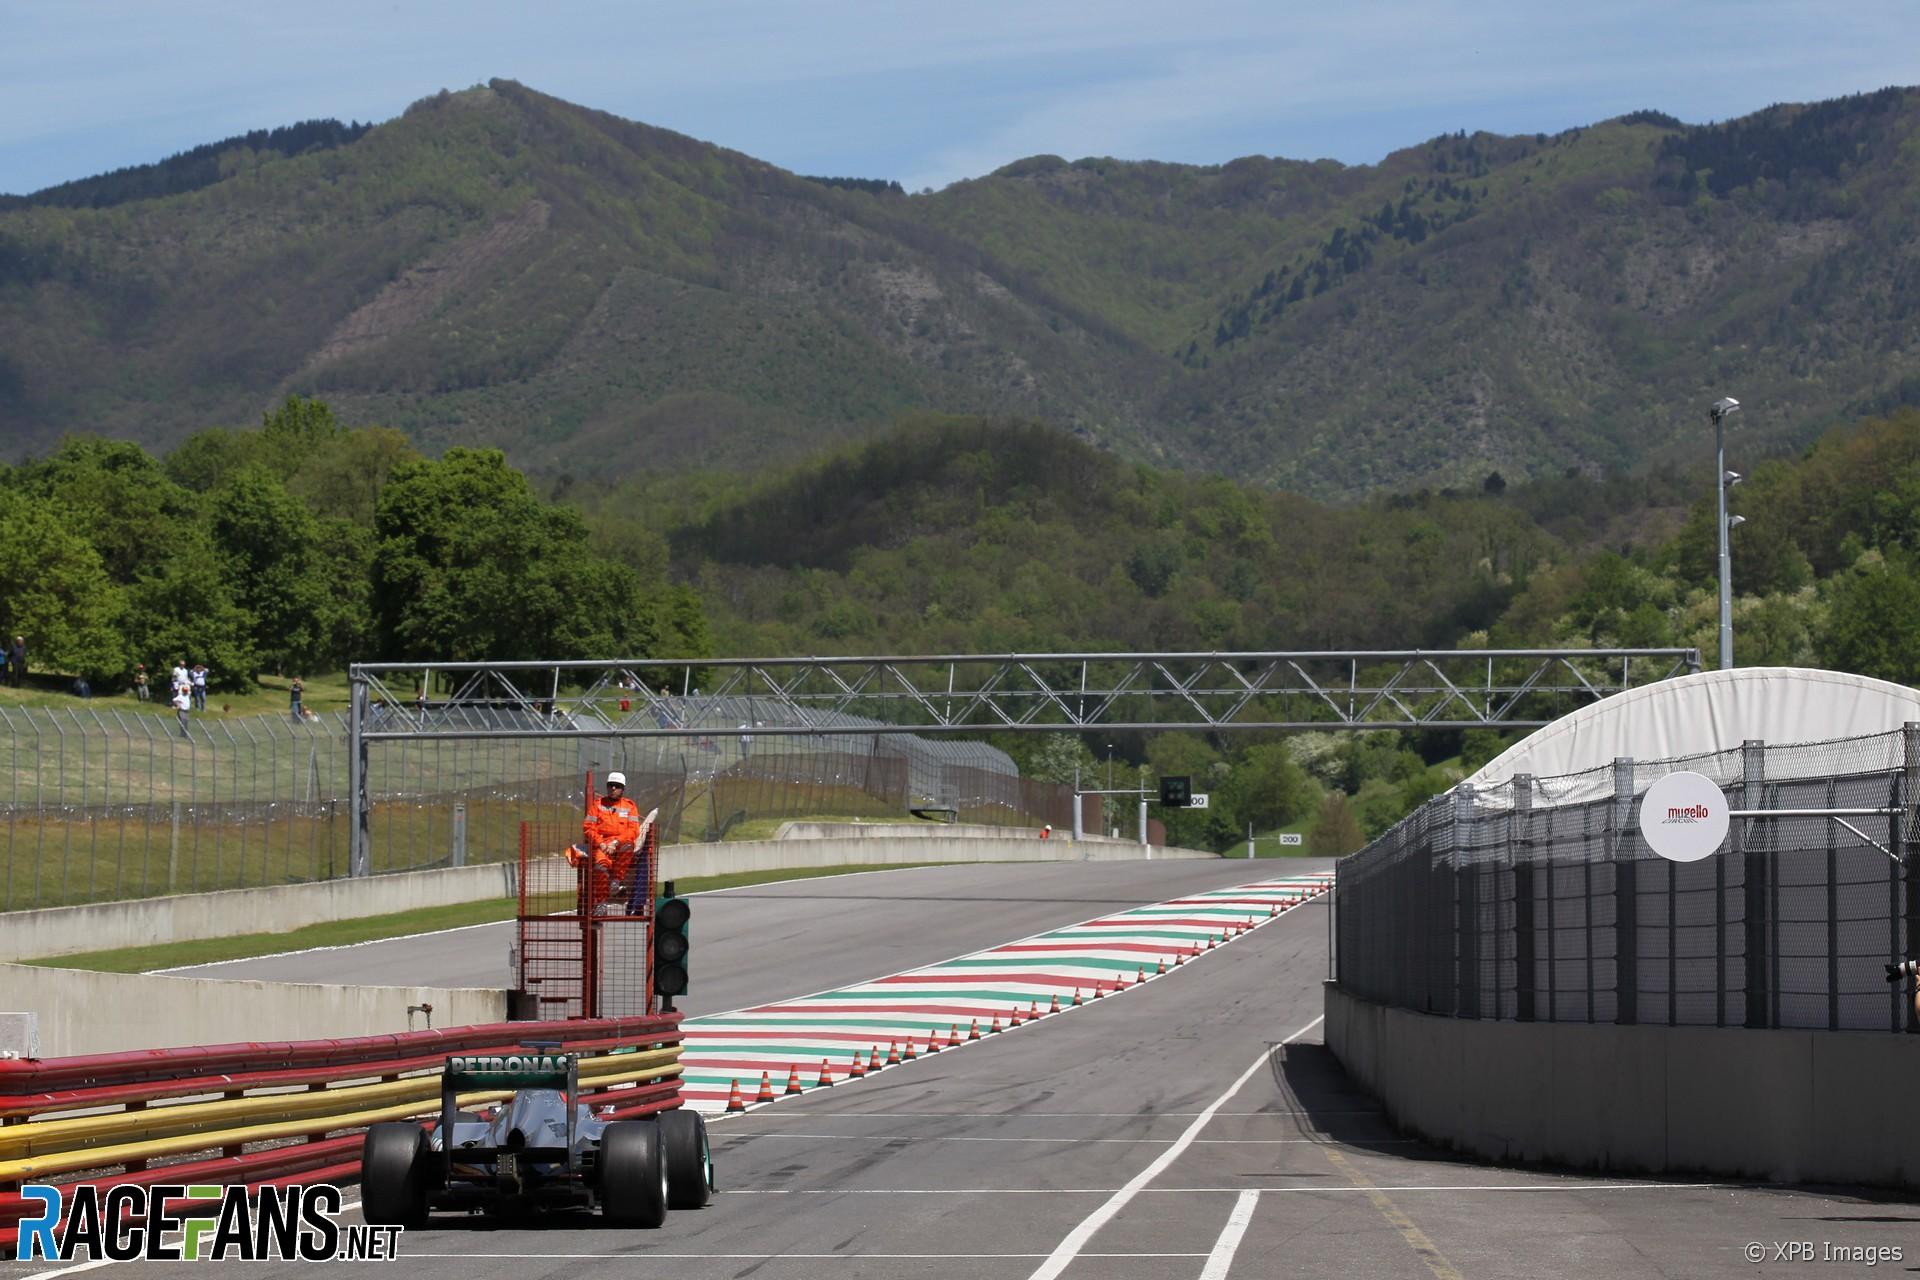 Michael Schumacher, Mercedes, Mugello, 2012